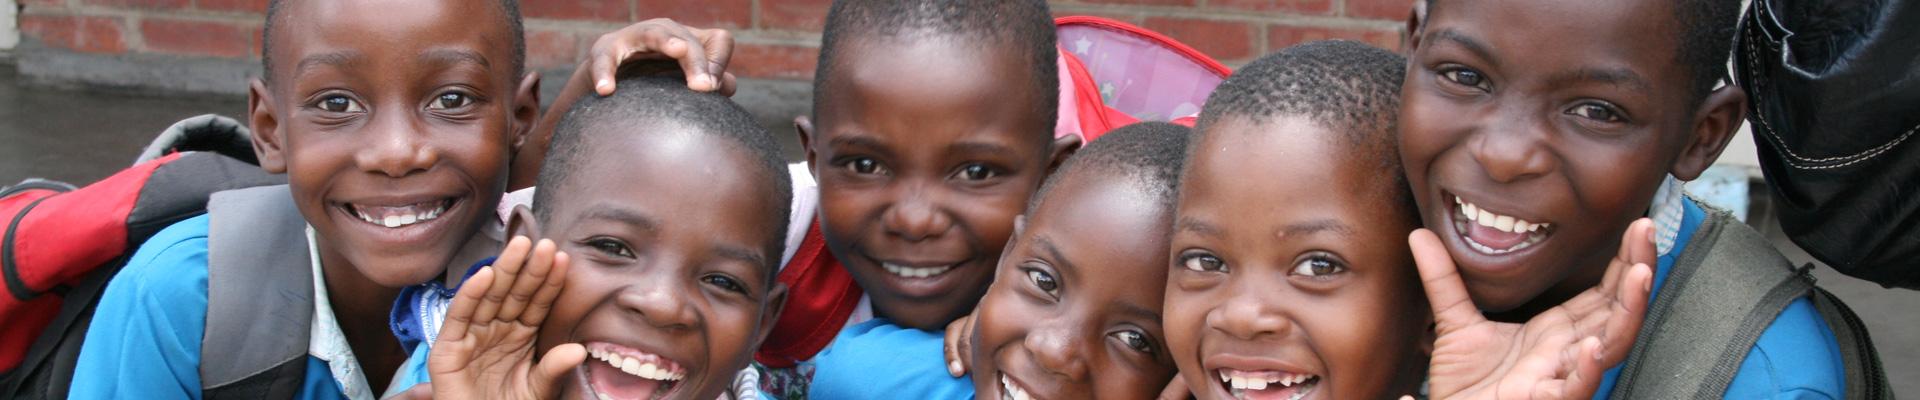 Students of LALC Zimbabwe